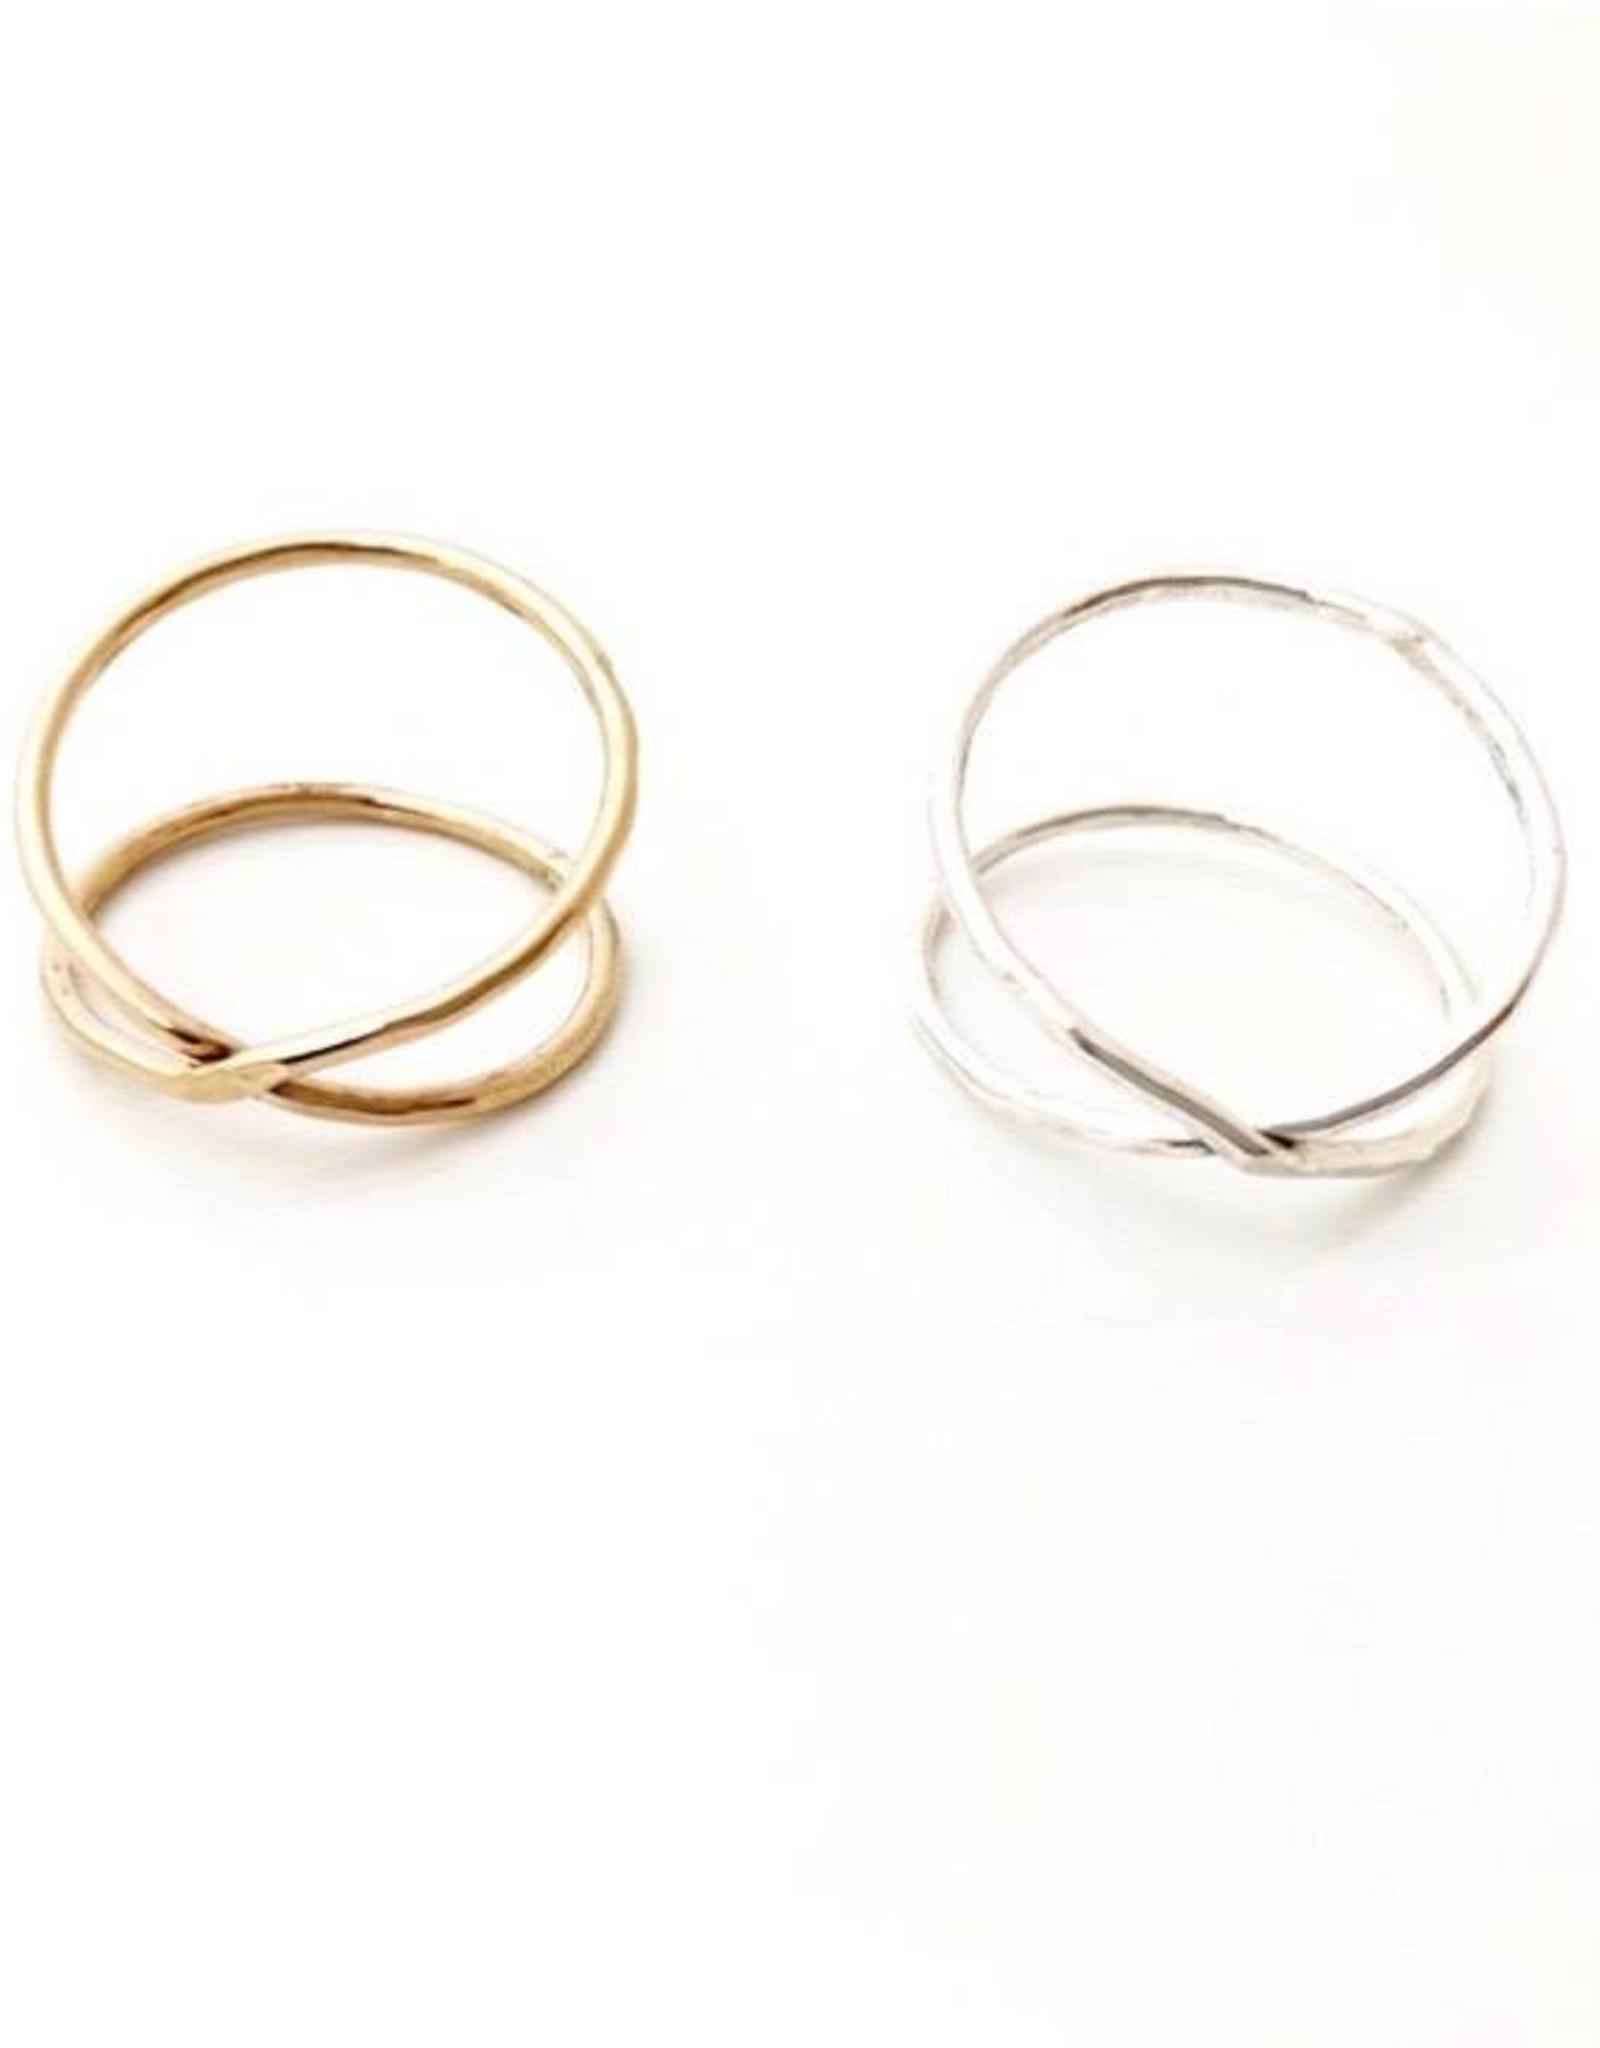 SAK bijoux BARKLEY ring, GOLD